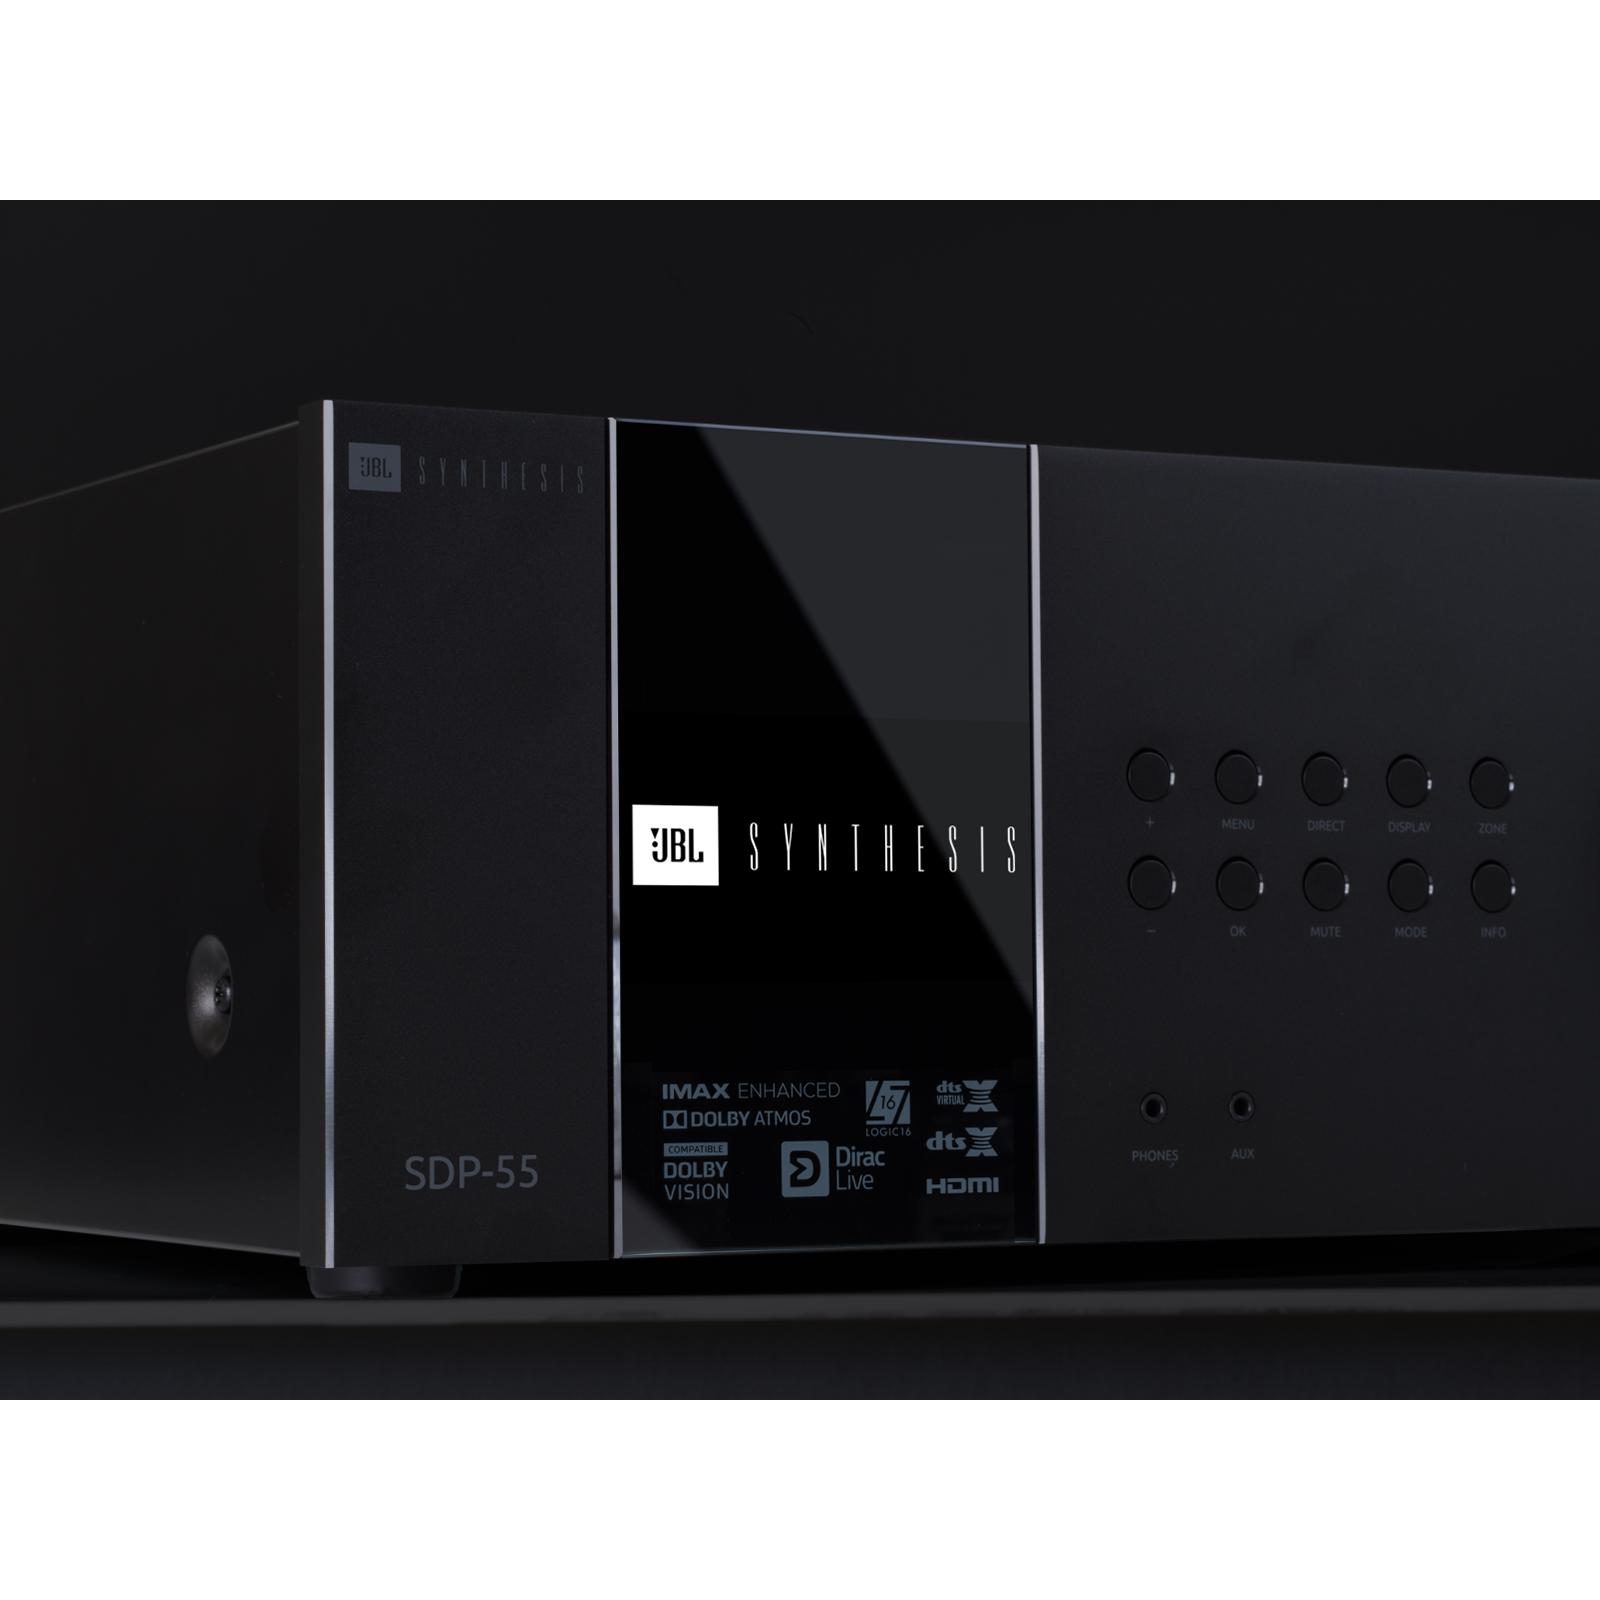 SDP-55 - Black - 16 Ch. Immersive Surround Sound Processor with Dante - Detailshot 1